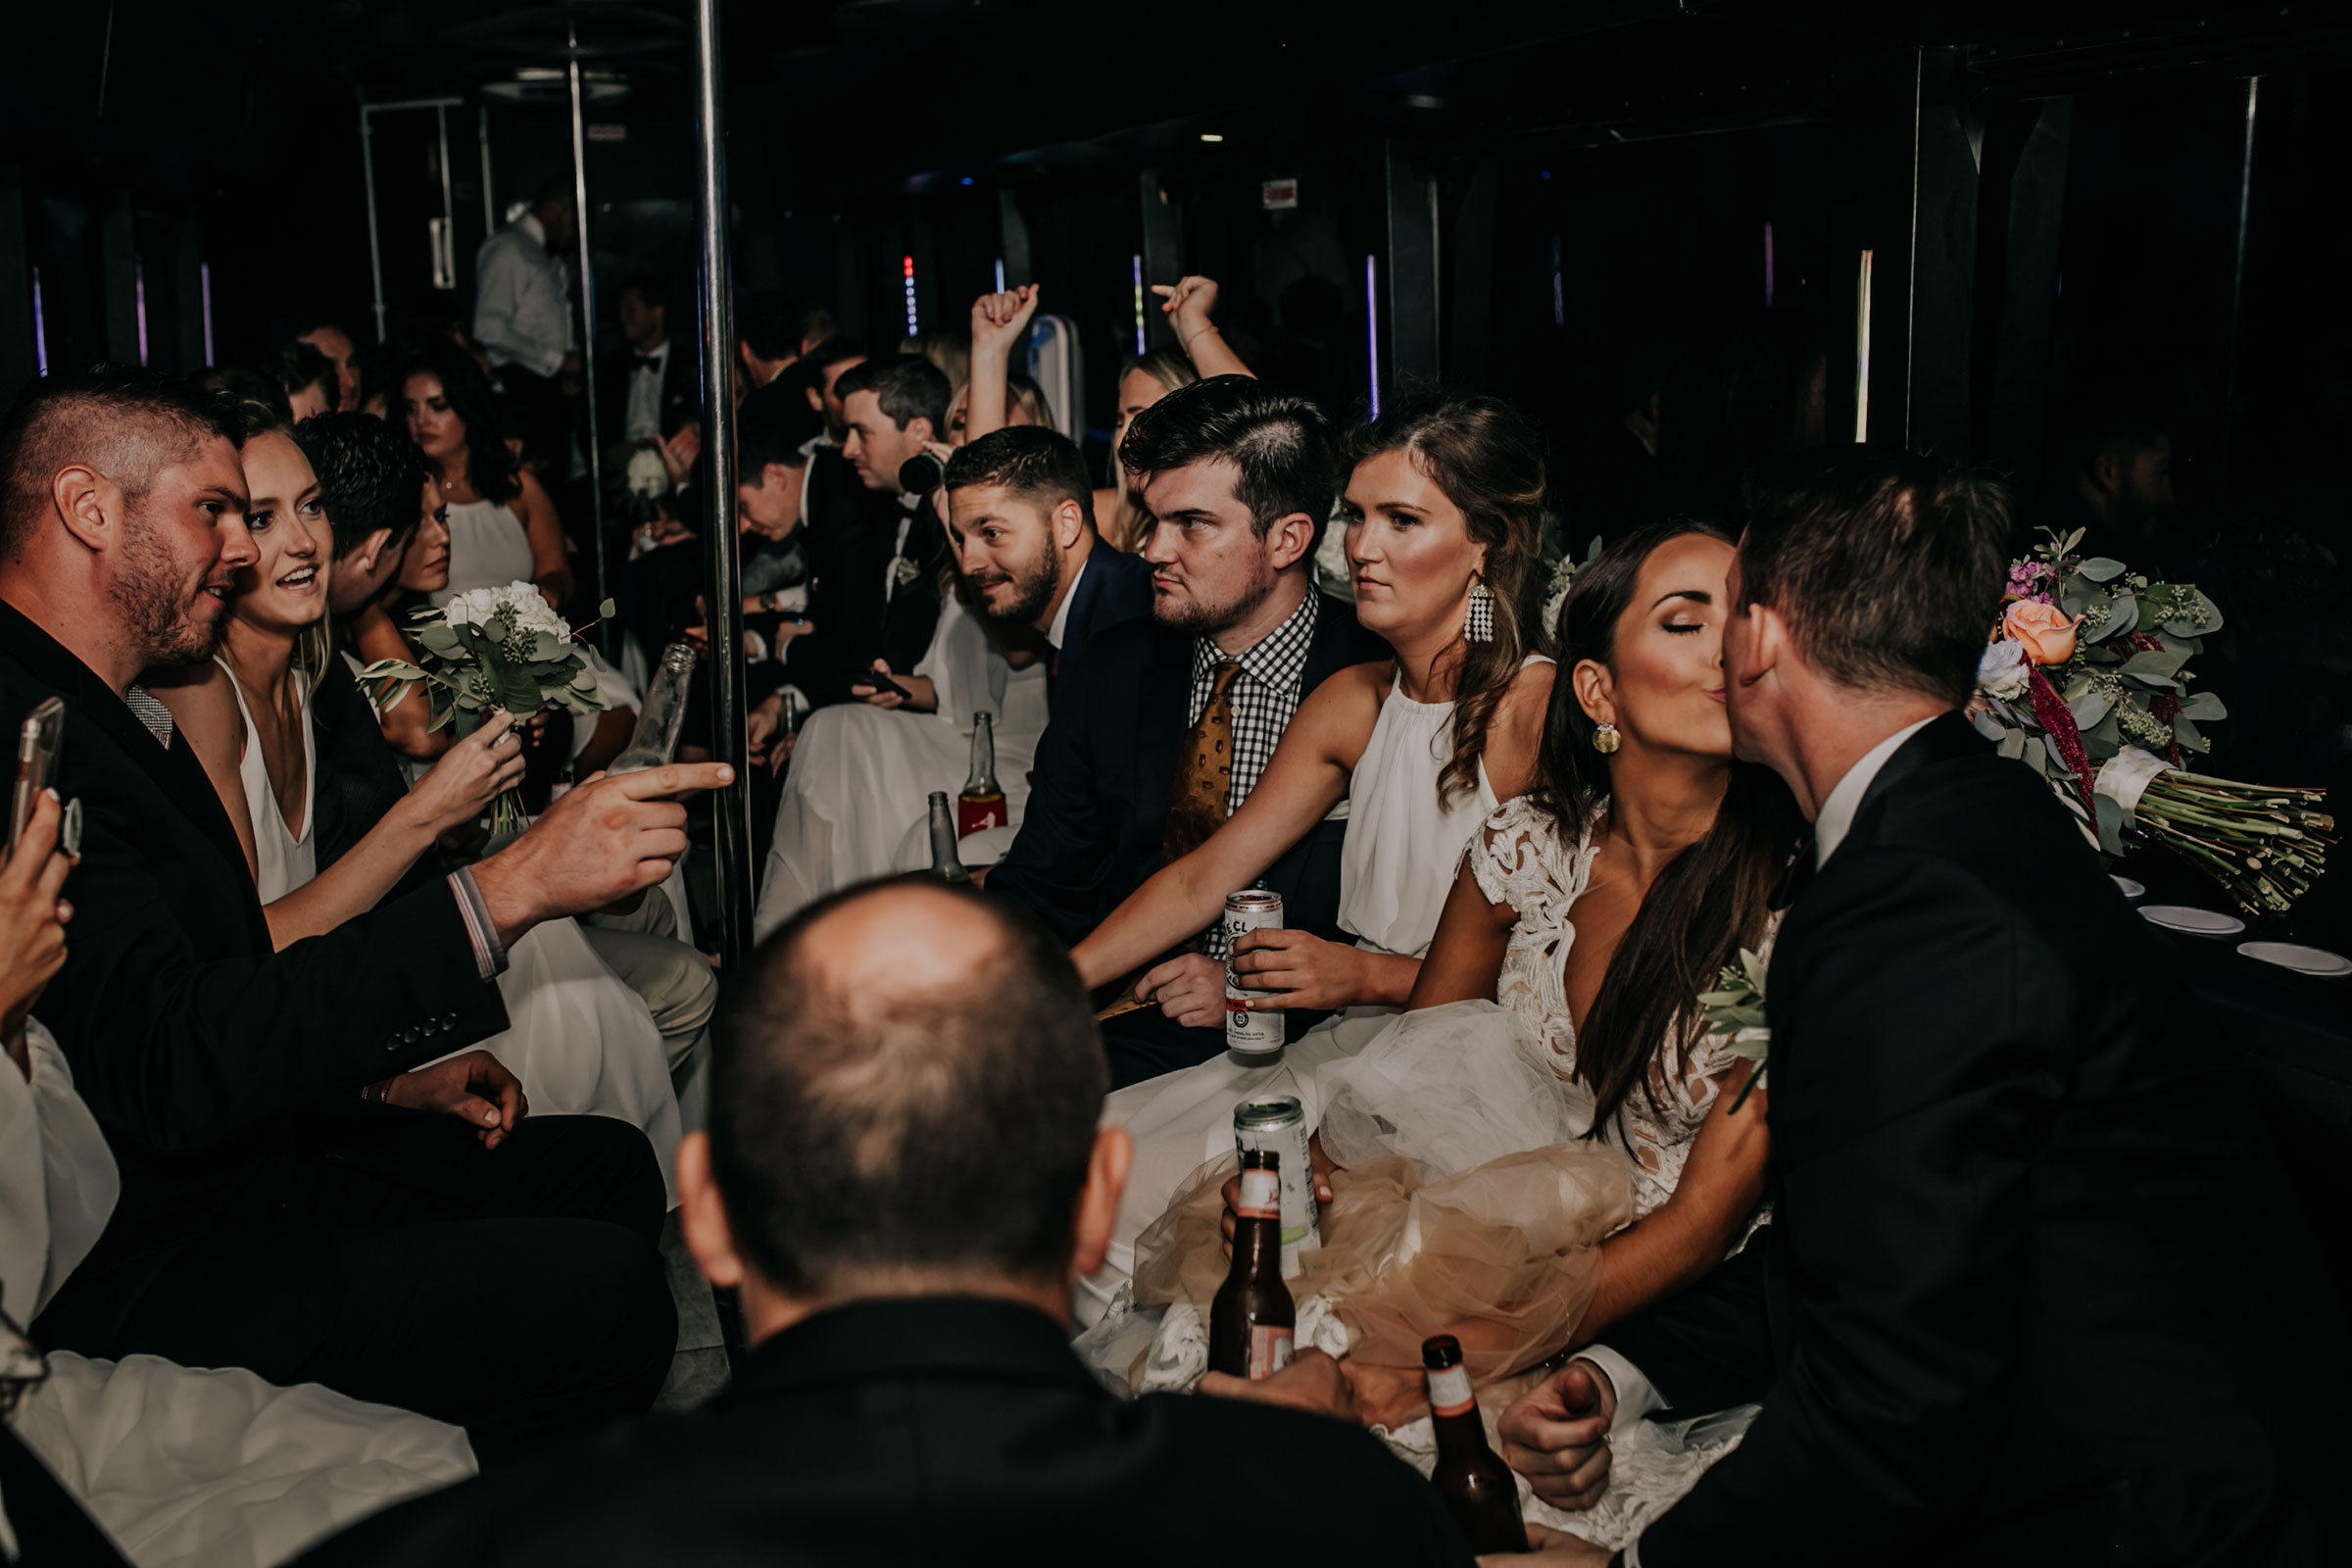 bride-groom-kissing-on-party-bus-omaha-nebraska-raelyn-ramey-photography.jpg